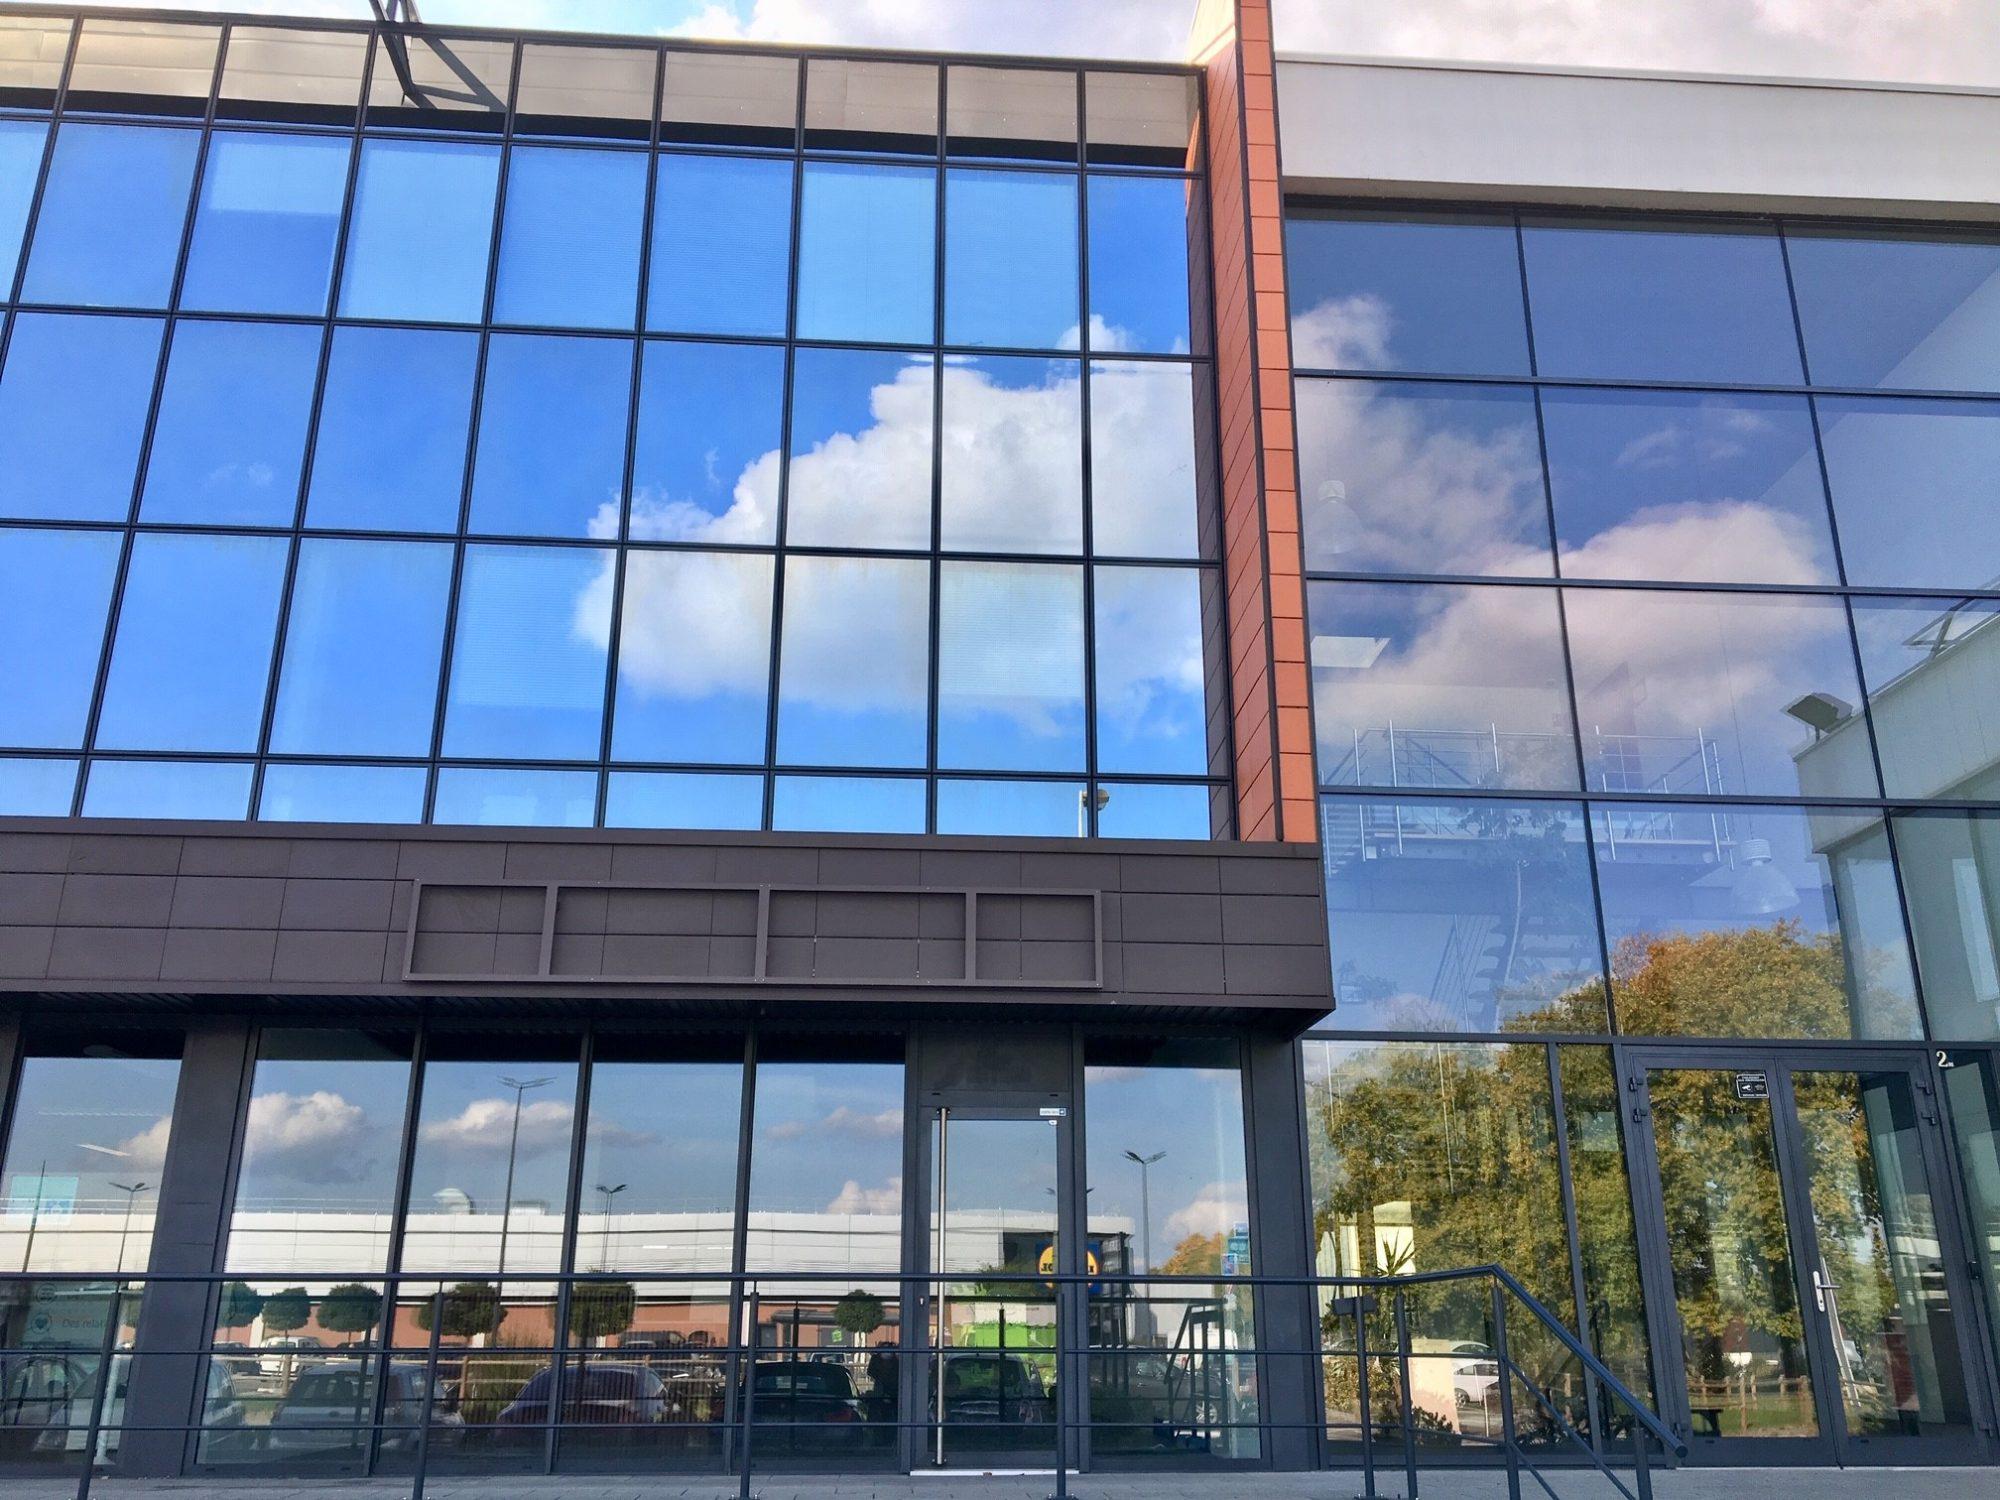 Bureaux aménagés et lumineux  de 610m² à Bischheim